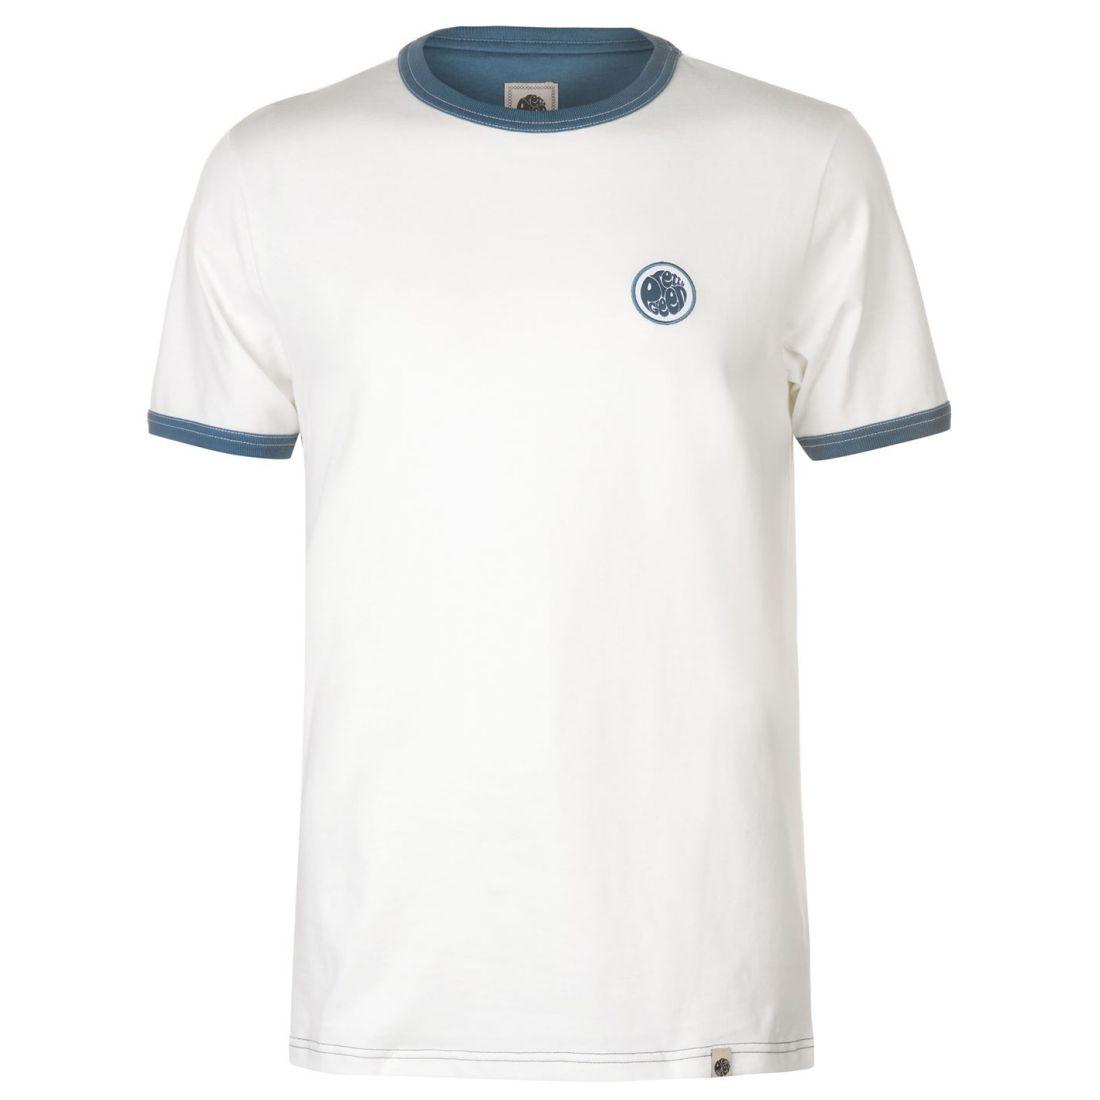 1276cec04ca5 Mens Pretty Green Milford T Shirt Crew Neck Short Sleeve New | eBay